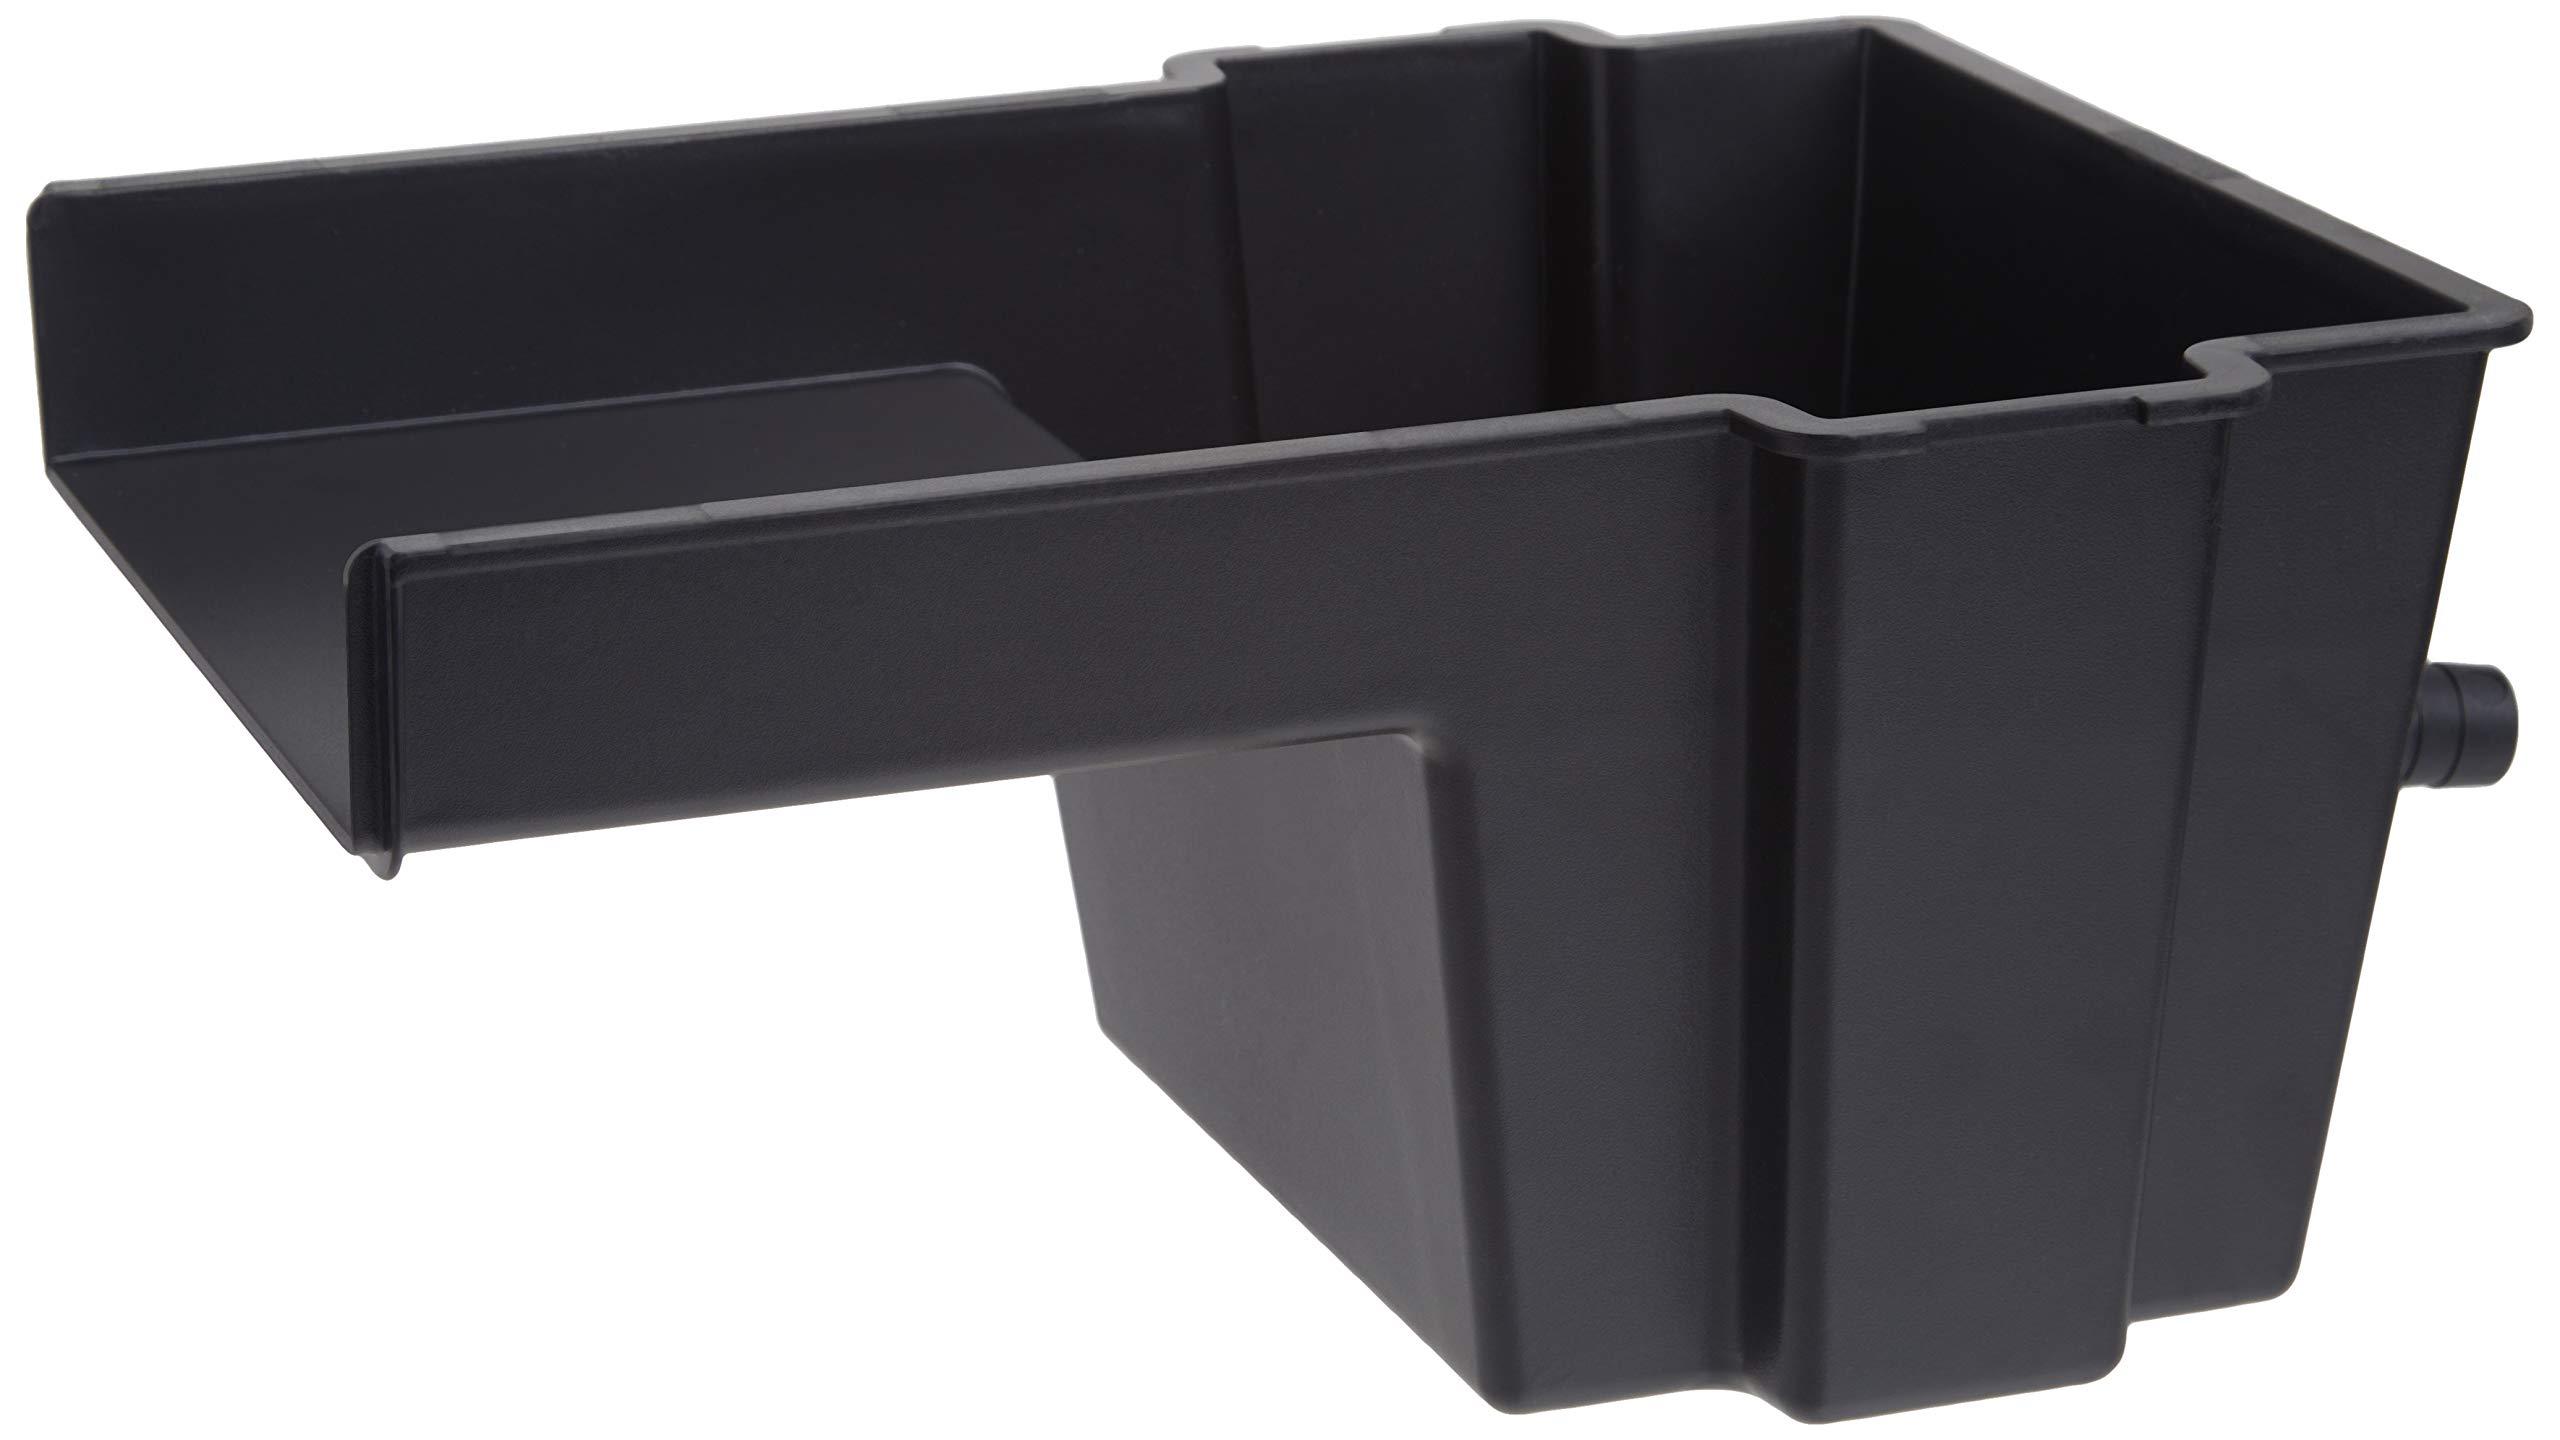 "Danner Manufacturing 871980900273 G188373 Waterfall Spillway, 8"", black"